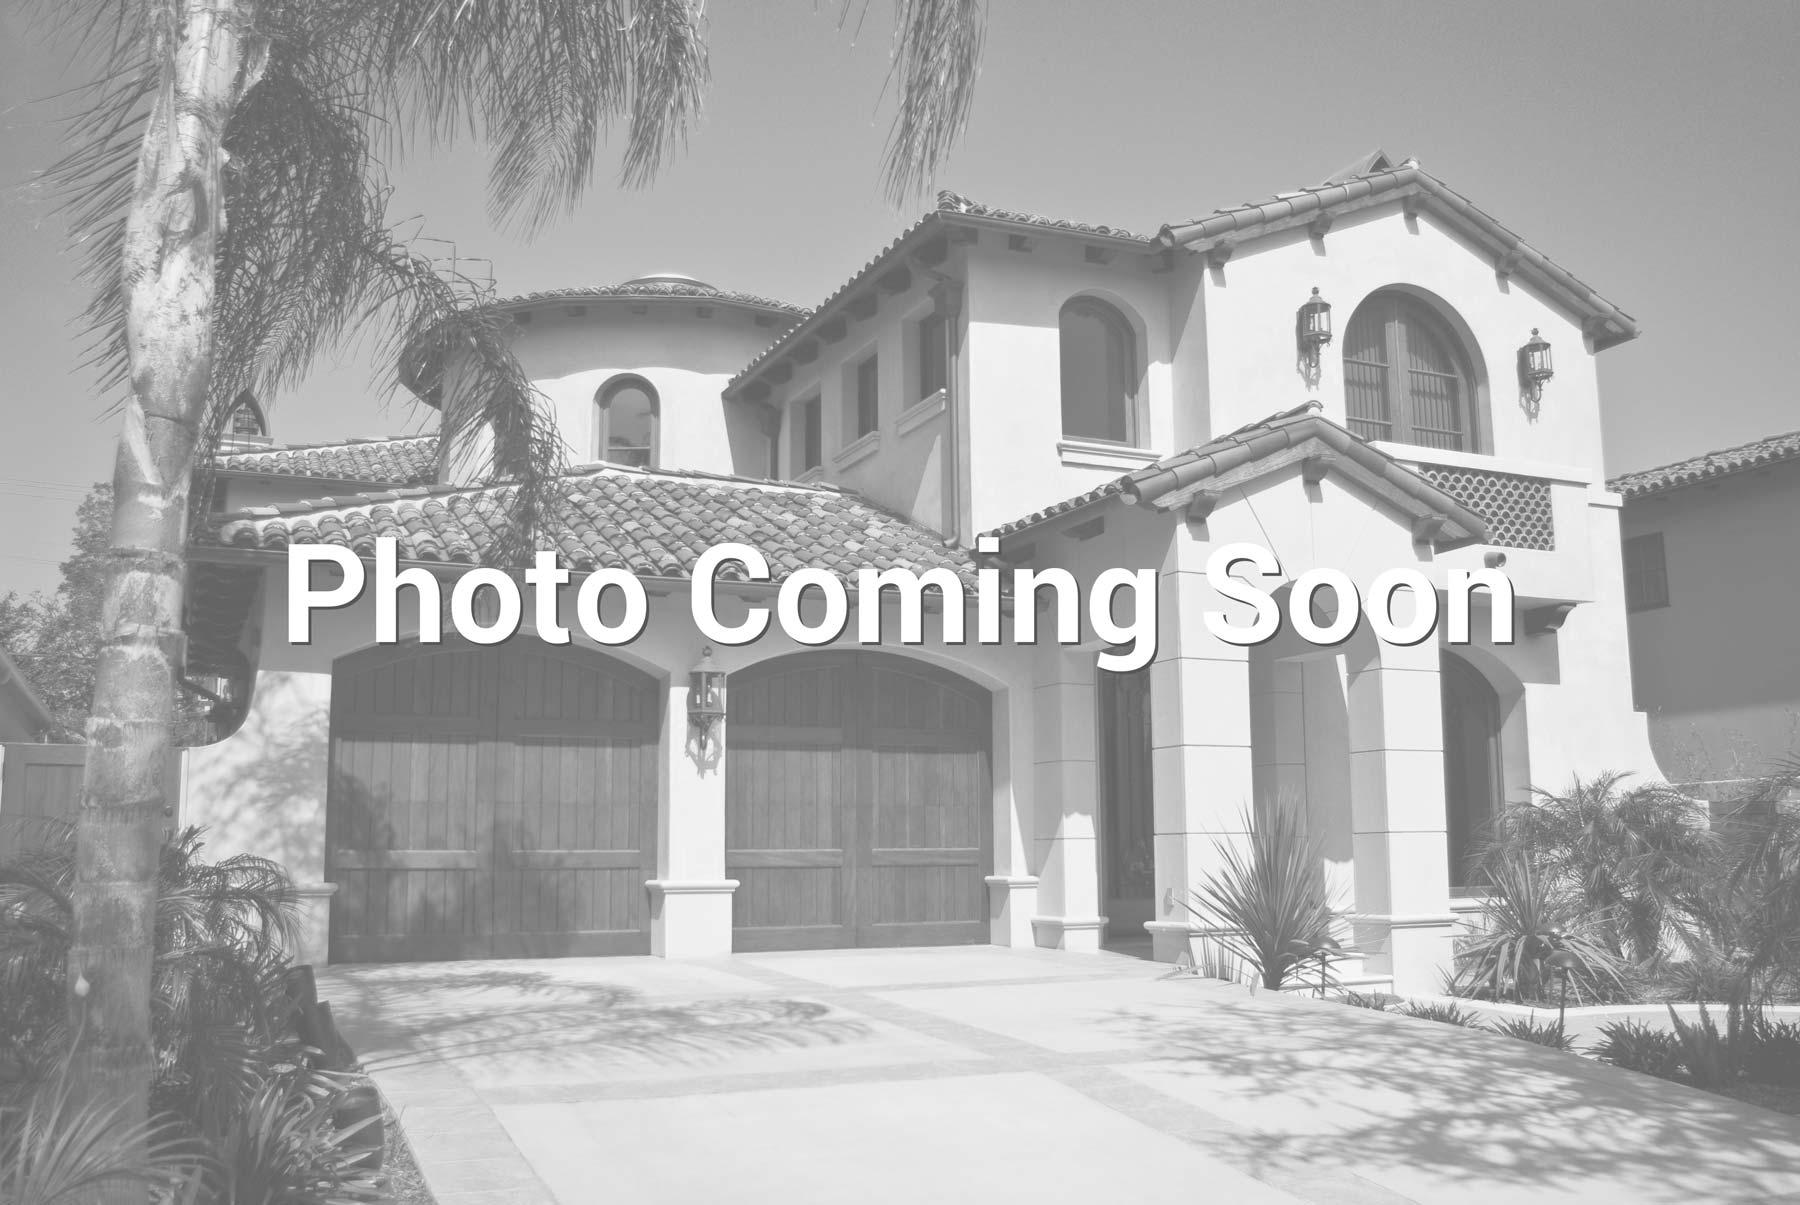 $949,000 - 5Br/4Ba - Home for Sale in Desert Ridge Lot 26, Phoenix